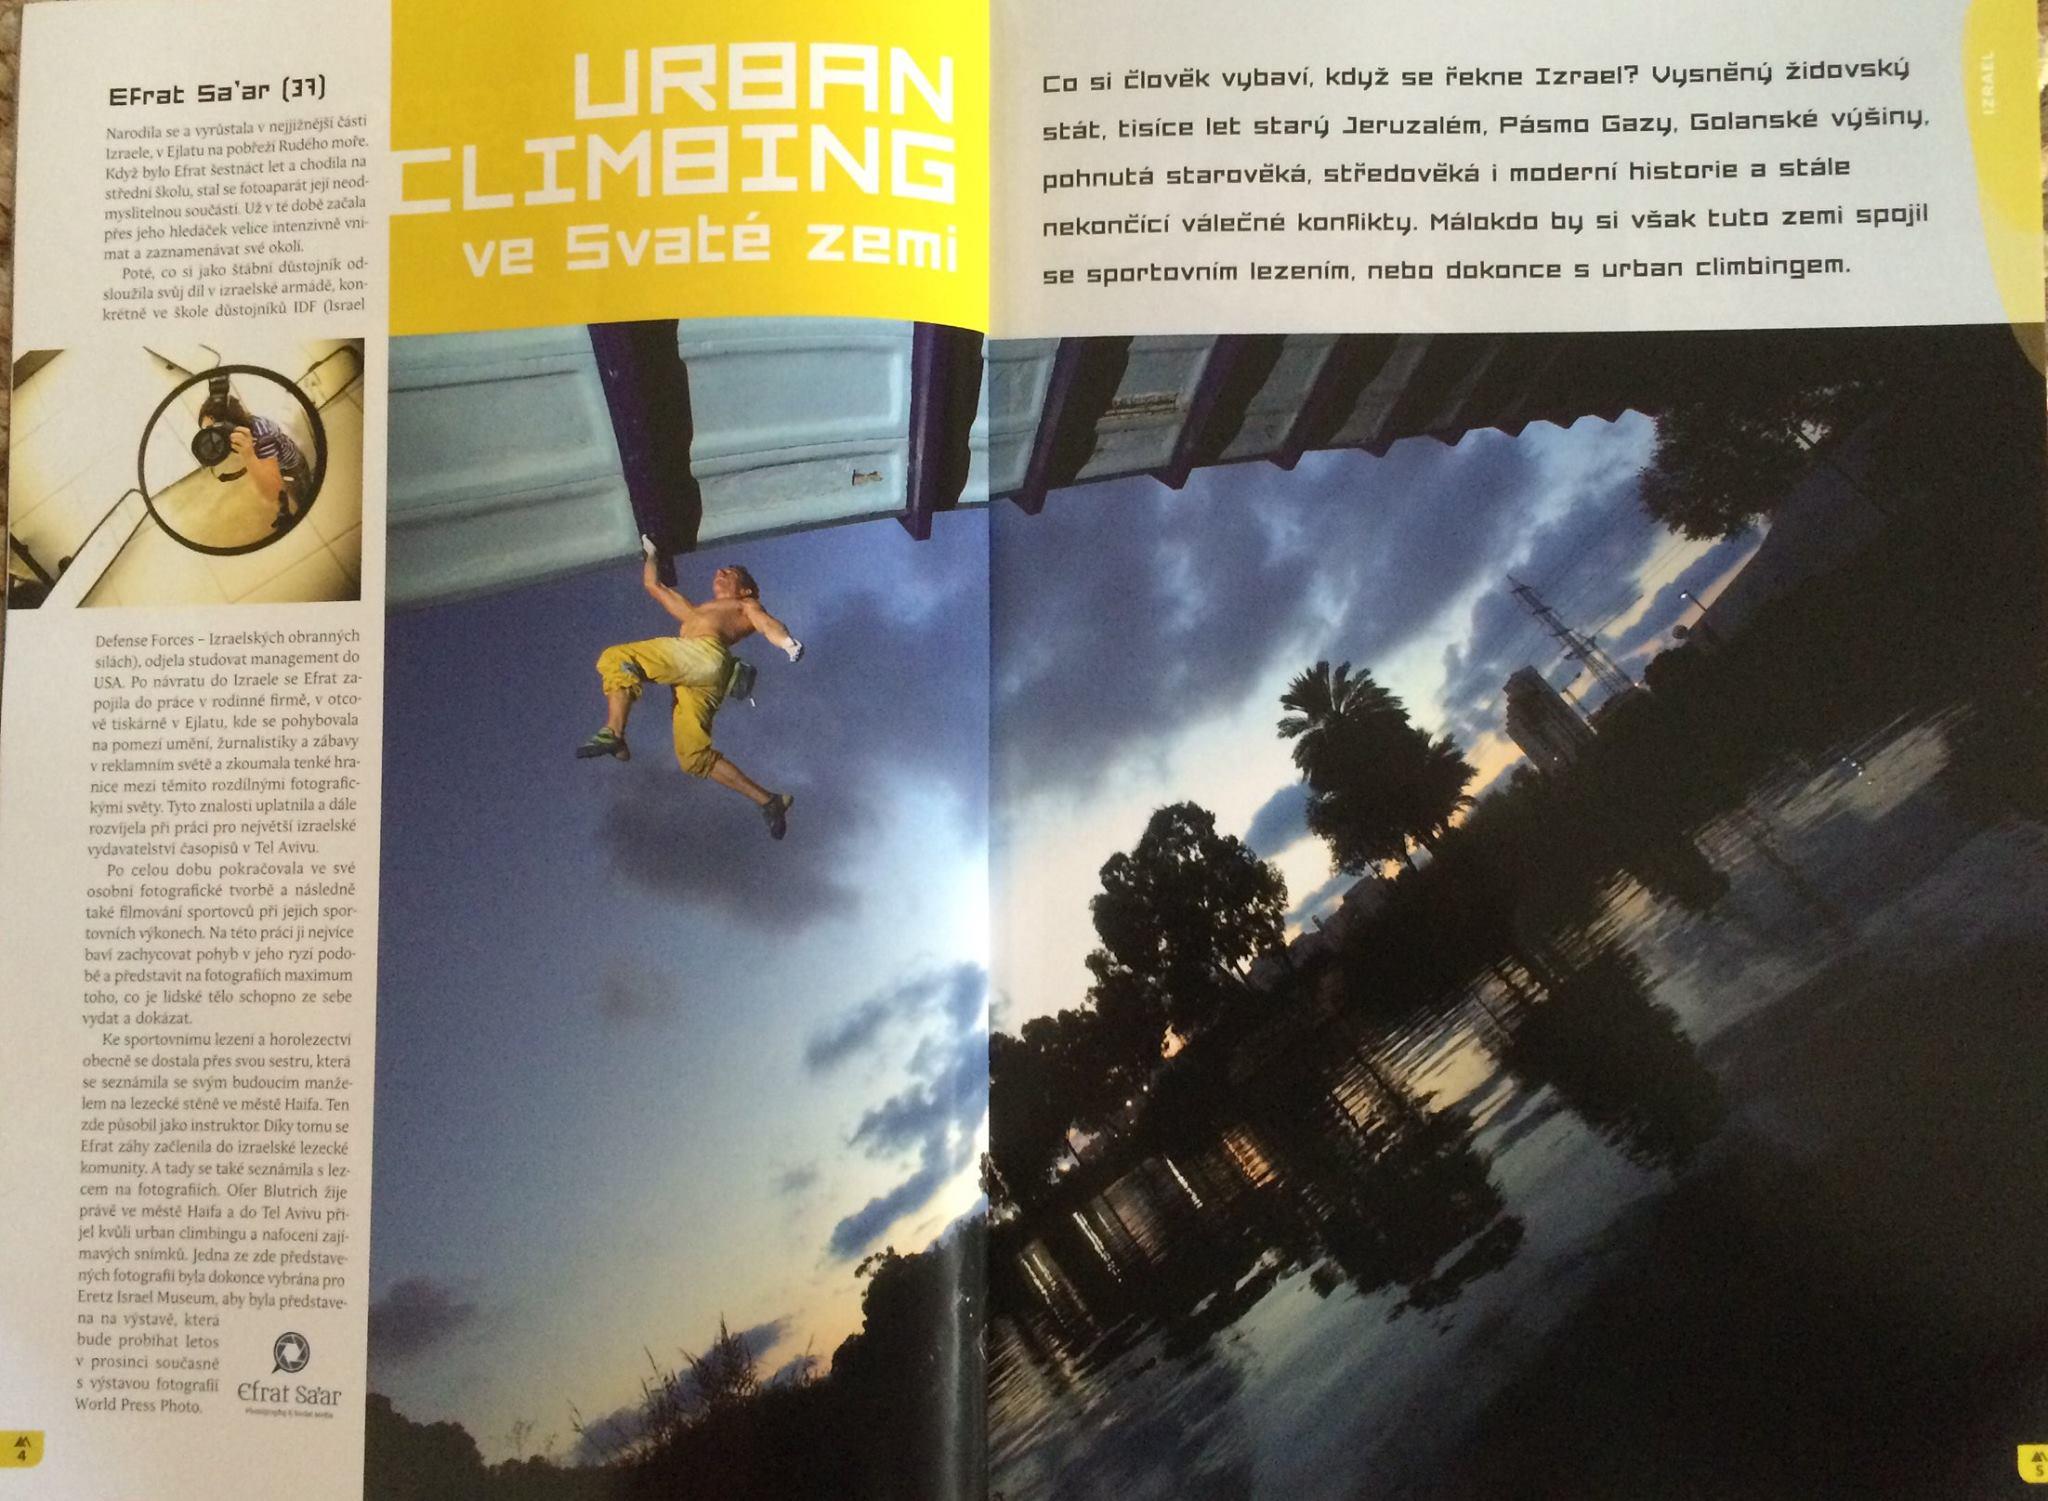 Climbing Magazine Ofer Blutraich